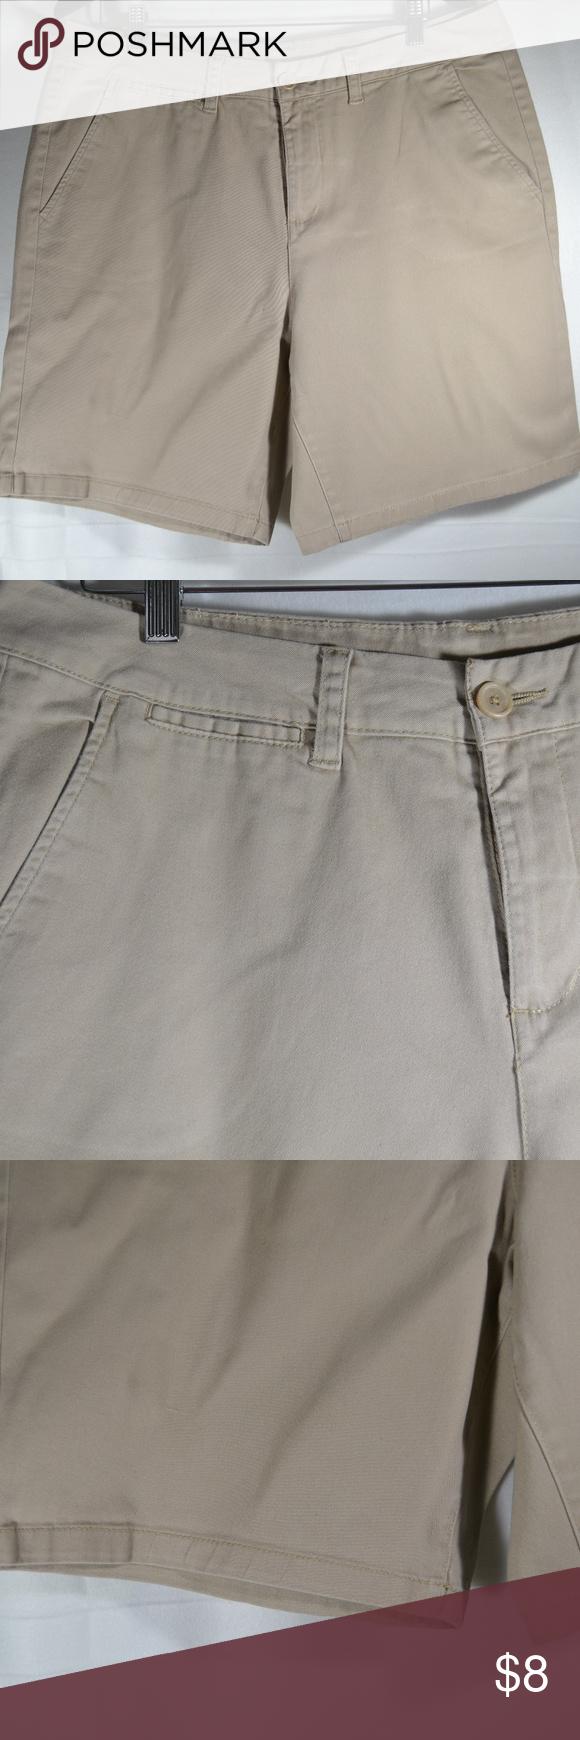 ec439b05cd2 White Stag Bermuda Classic Khaki shorts Pants White Stag Women s Flat Front  Bermuda Classic Khaki shorts